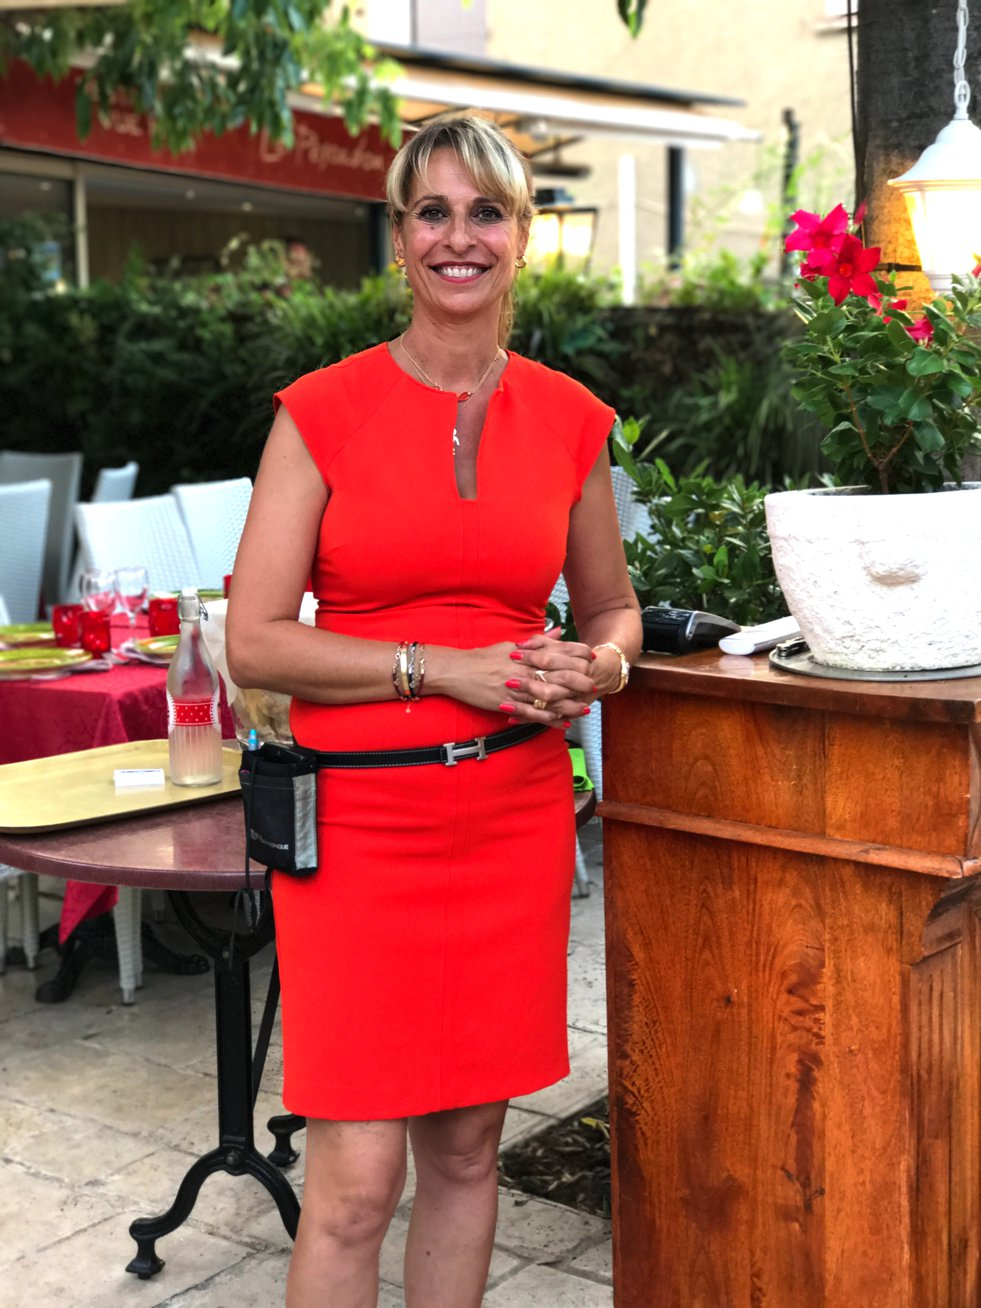 Sophie Bonte Le Micocoulier Gassin, Le Micocoulier Gassin, gutes Restraurant Gassin, Lifestyle-Blog, Lieblingsstil.com,